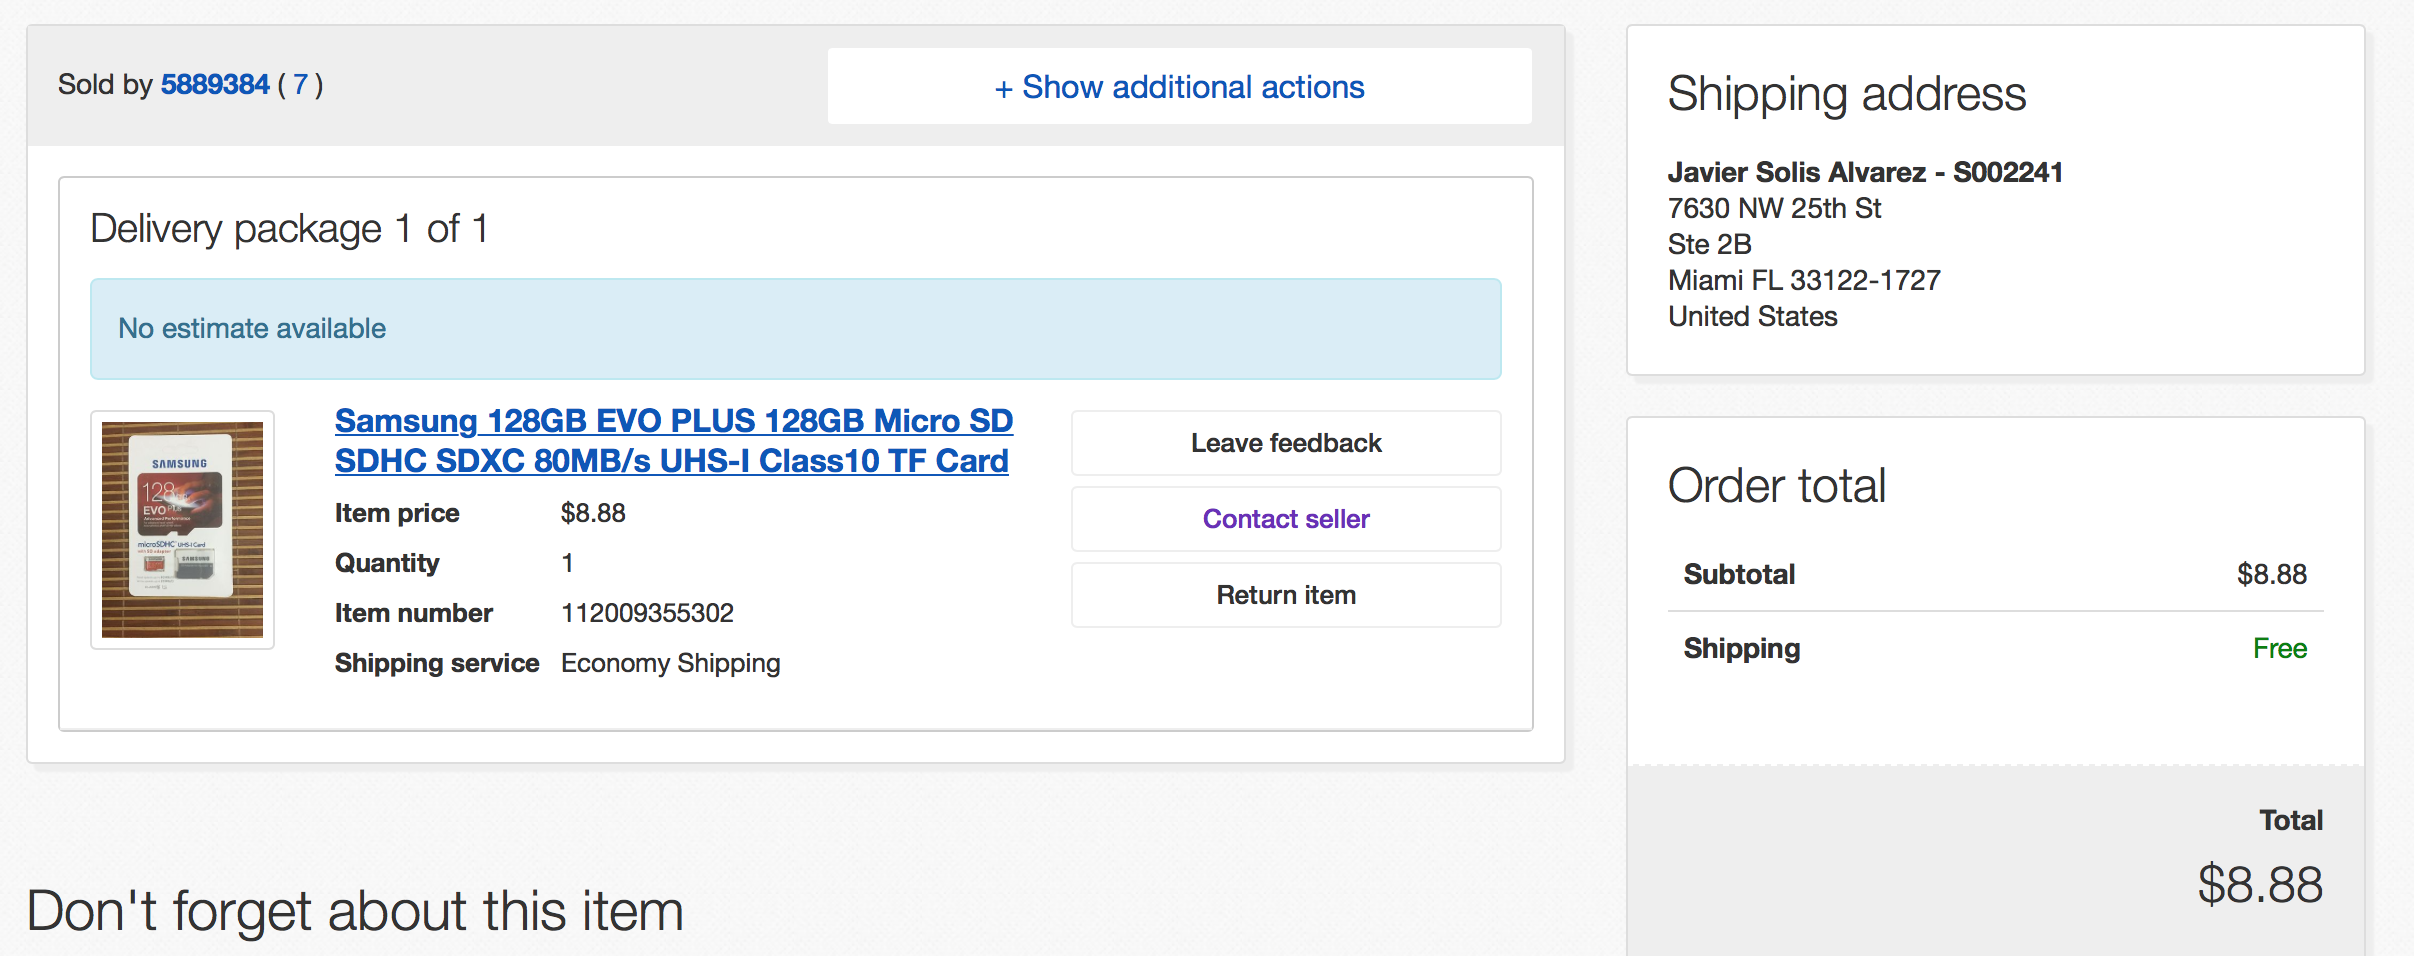 Http Vod Ebay Com Vod Fetchorderdetails Itemid 1 The Ebay Community